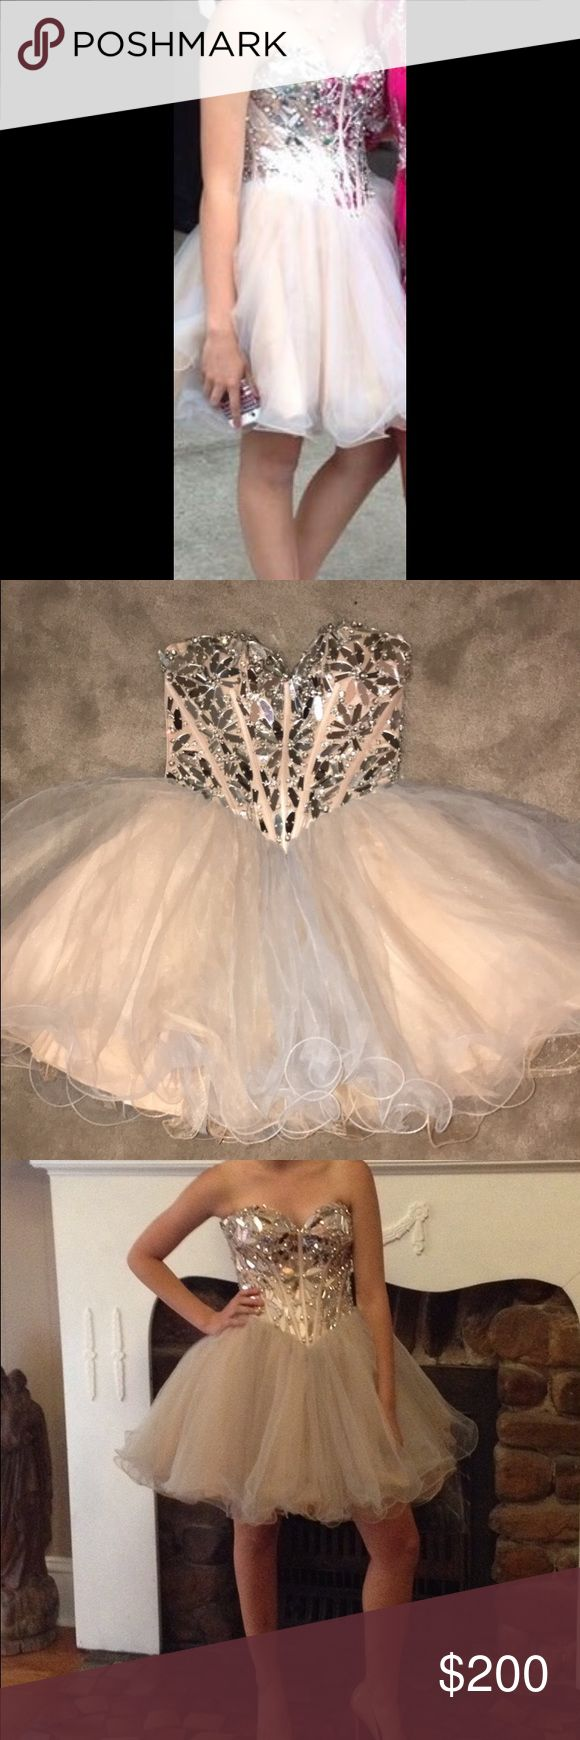 Sherri Hill Short Dress Sherri Hill Short 1403 Size 00 Dress. Perfect for Formal Dances. Worn Once. Open to negotiations for price Sherri Hill Dresses Prom